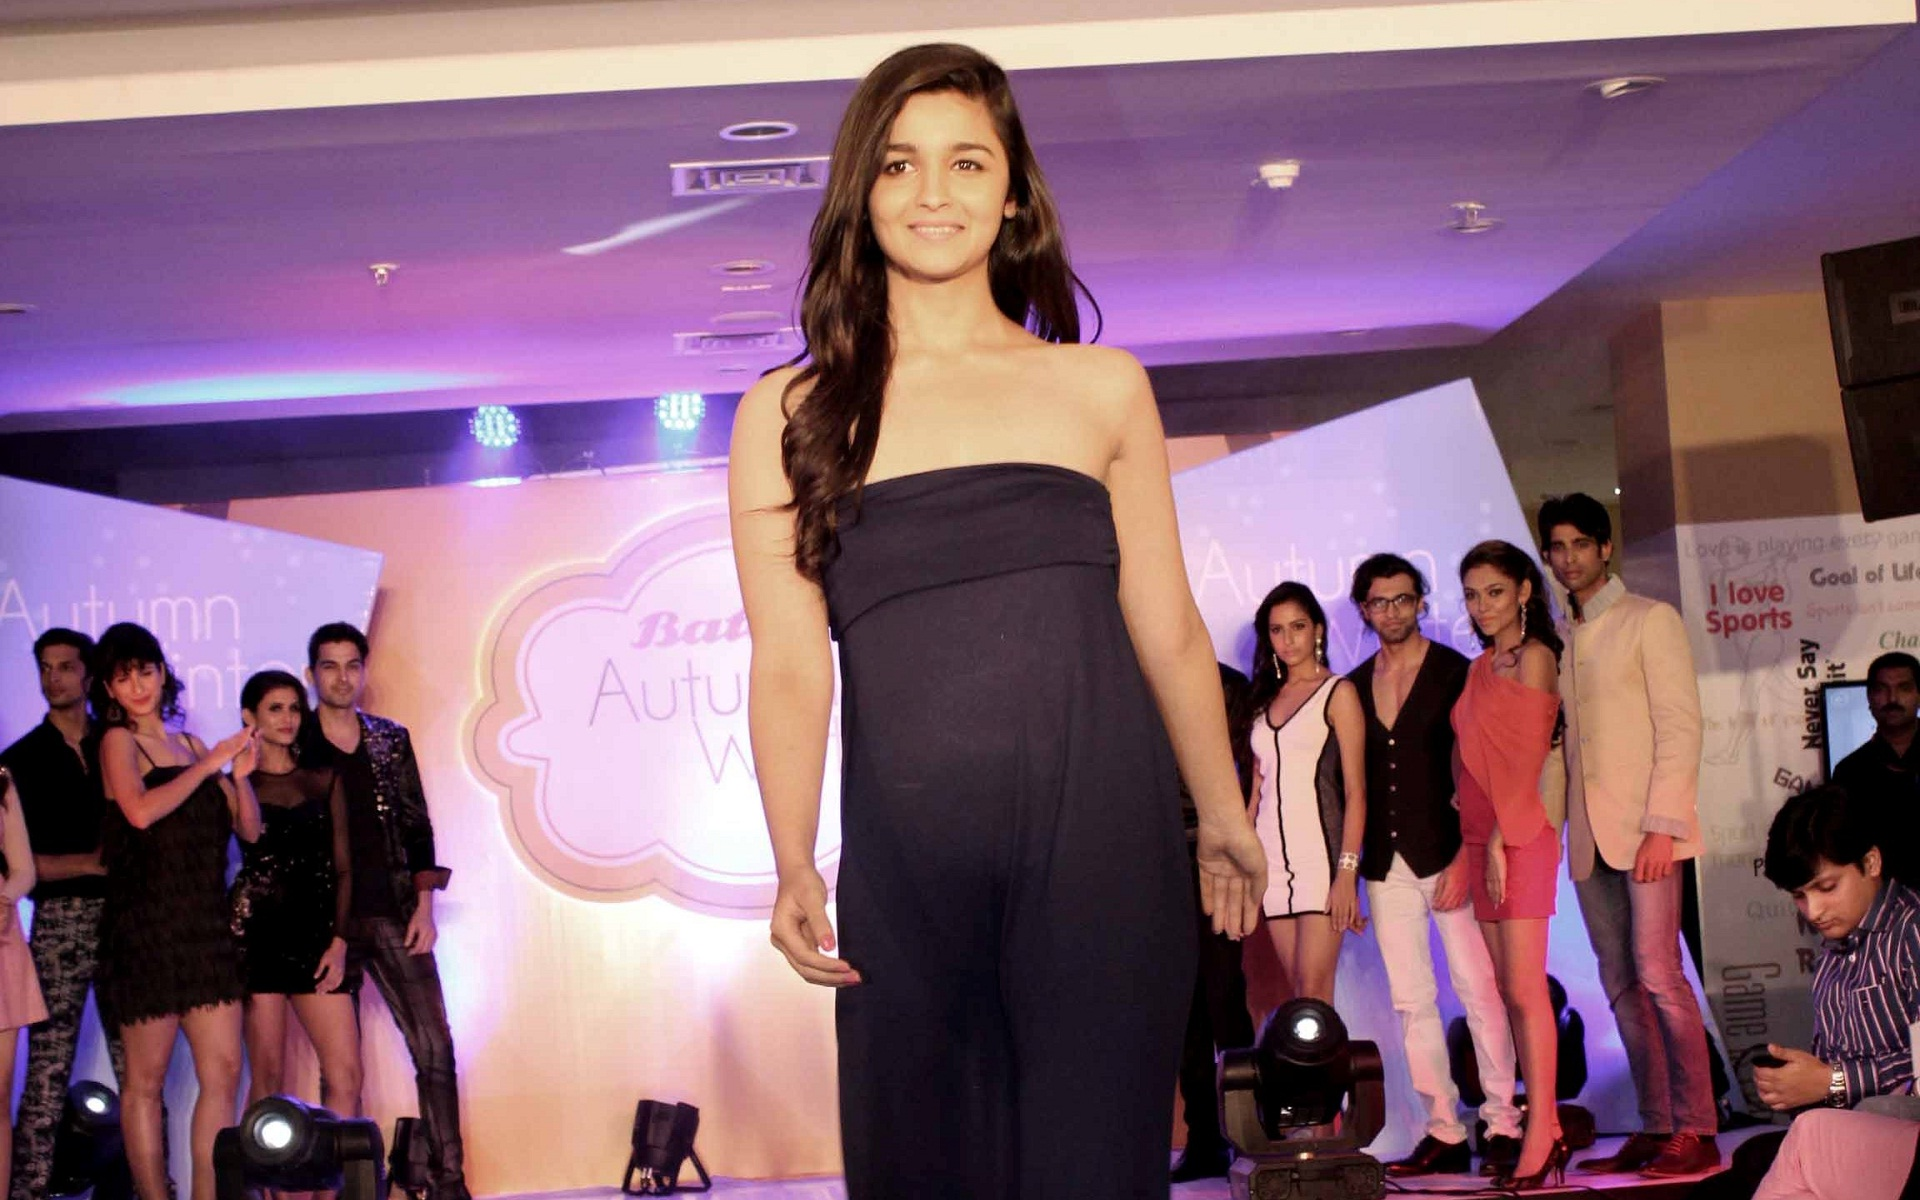 Alia Bhatt Hot Beauty In Black Dress Wallpapers And - Alia Bhatt Hot Beauty - HD Wallpaper